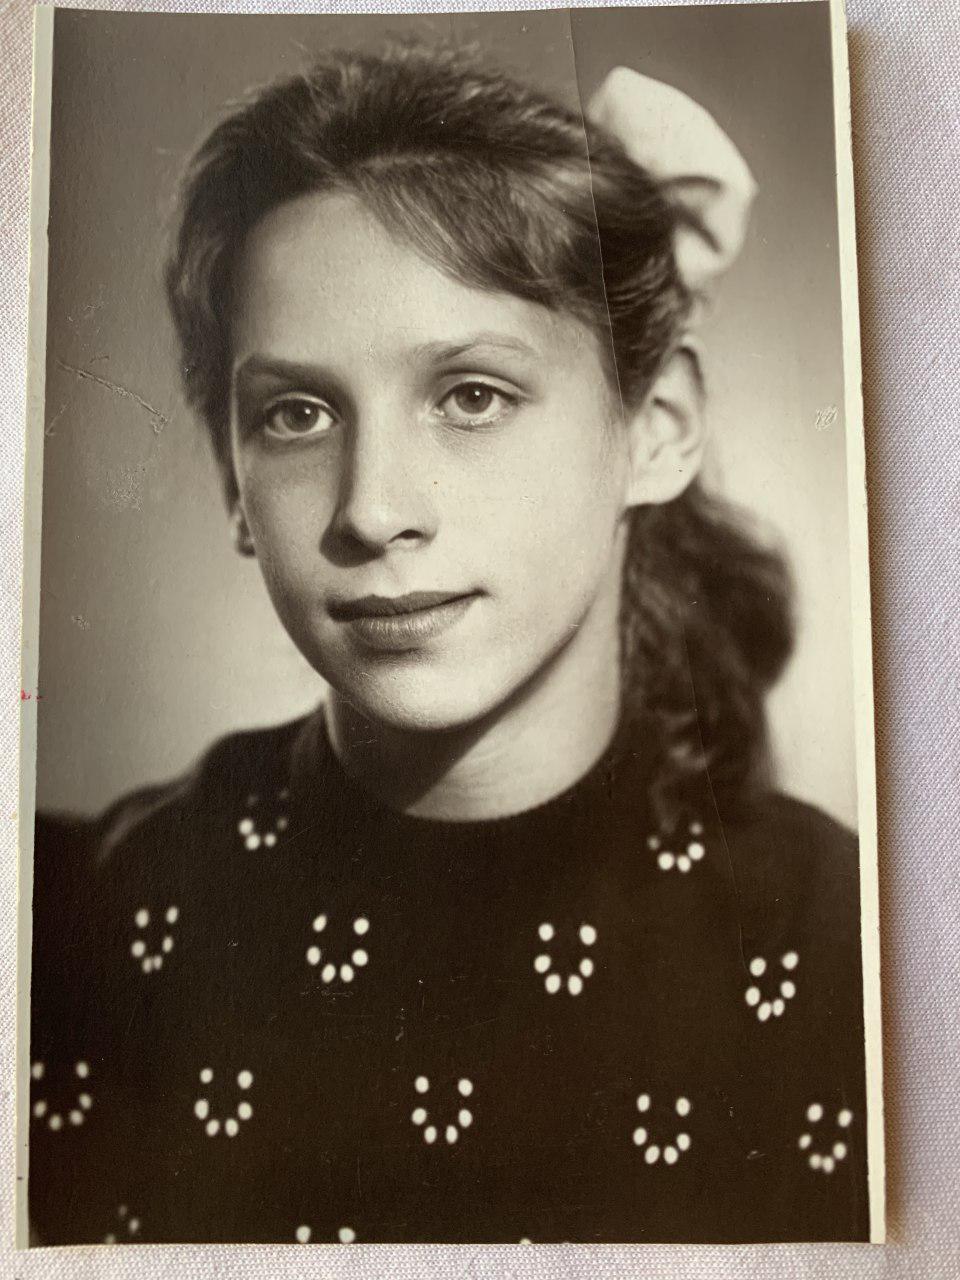 Людмила Кухаренко (Образцова) в молодости